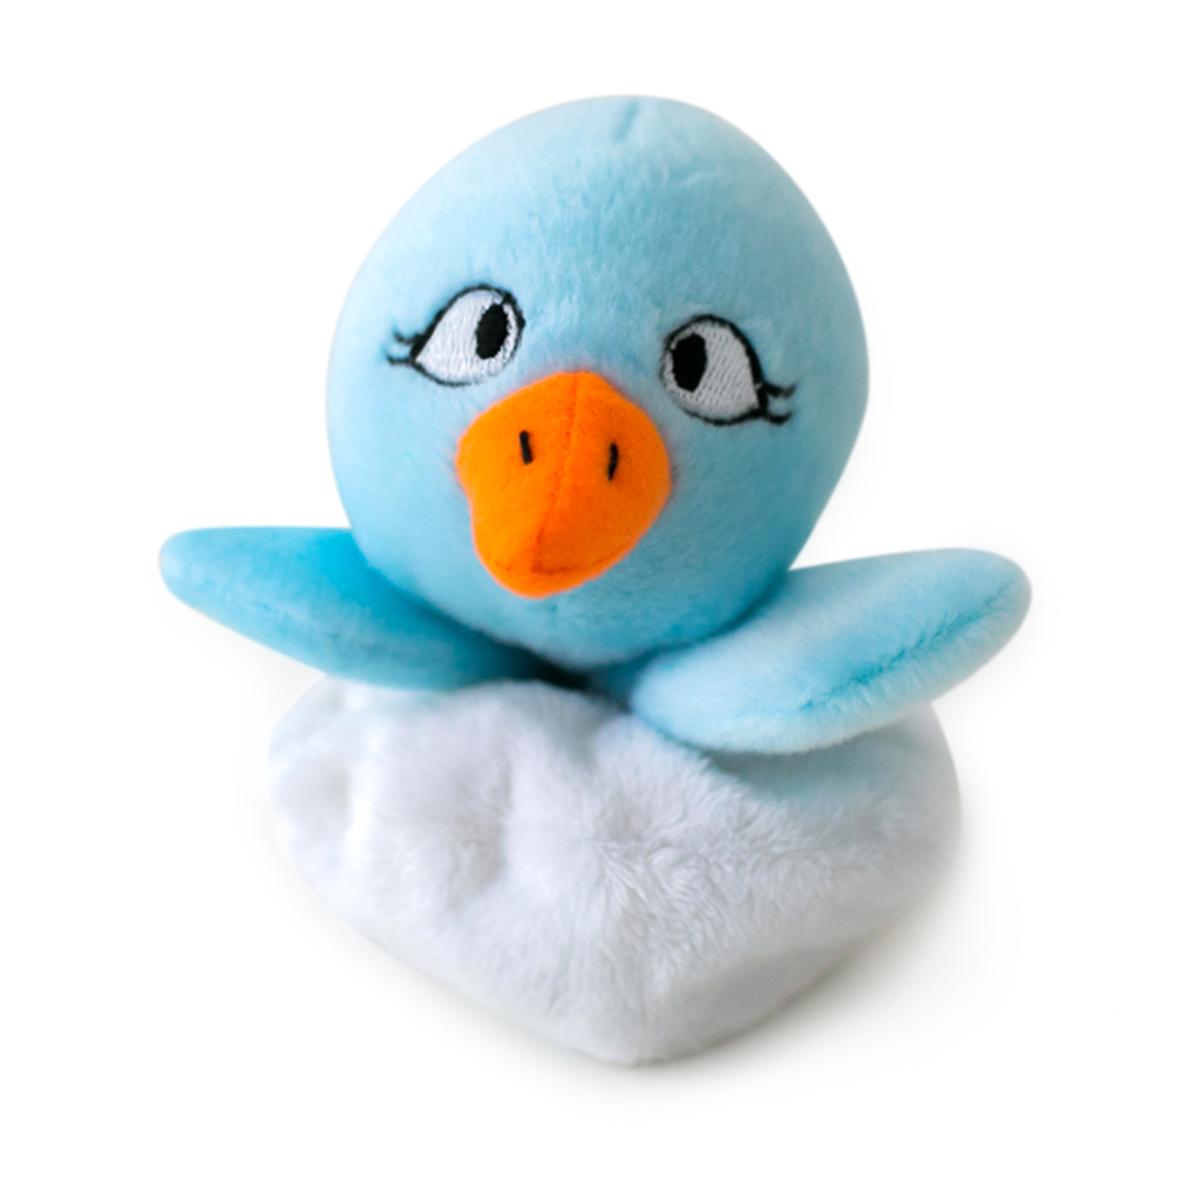 Hatchables Dog Toy - Blue Bird | BaxterBoo